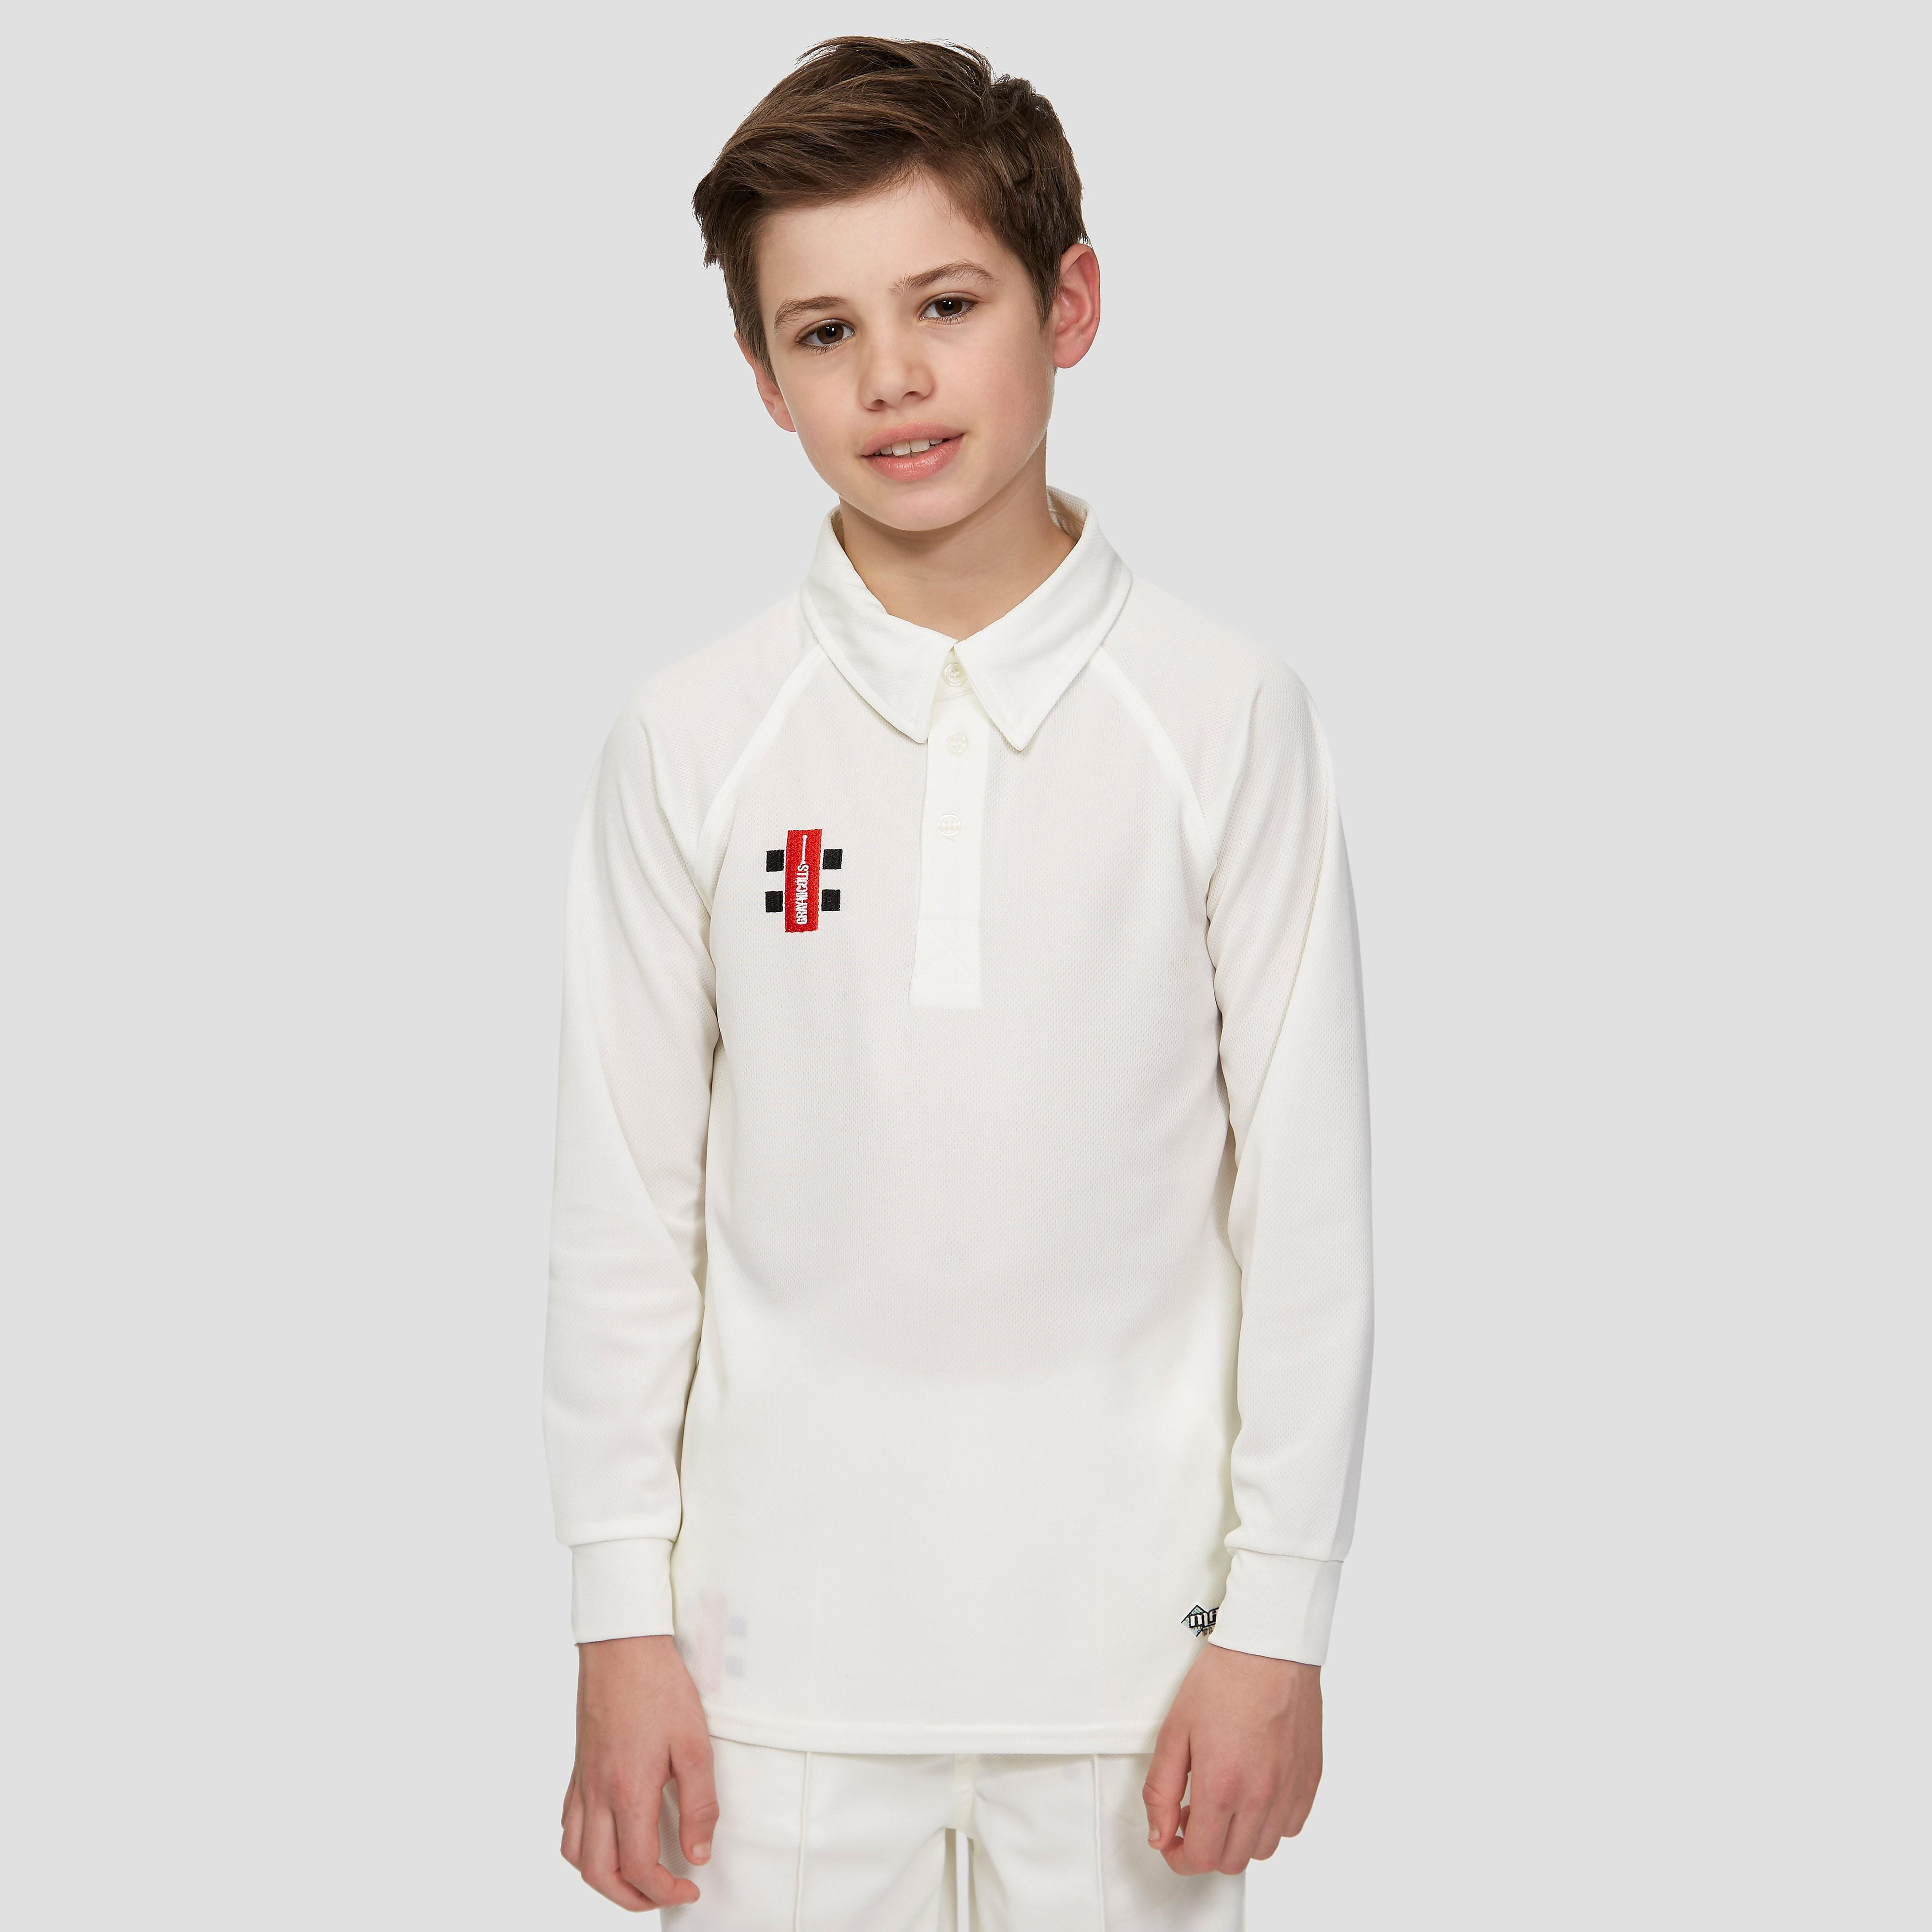 Gray Nicolls Matrix Long Sleeve Junior Cricket Shirt